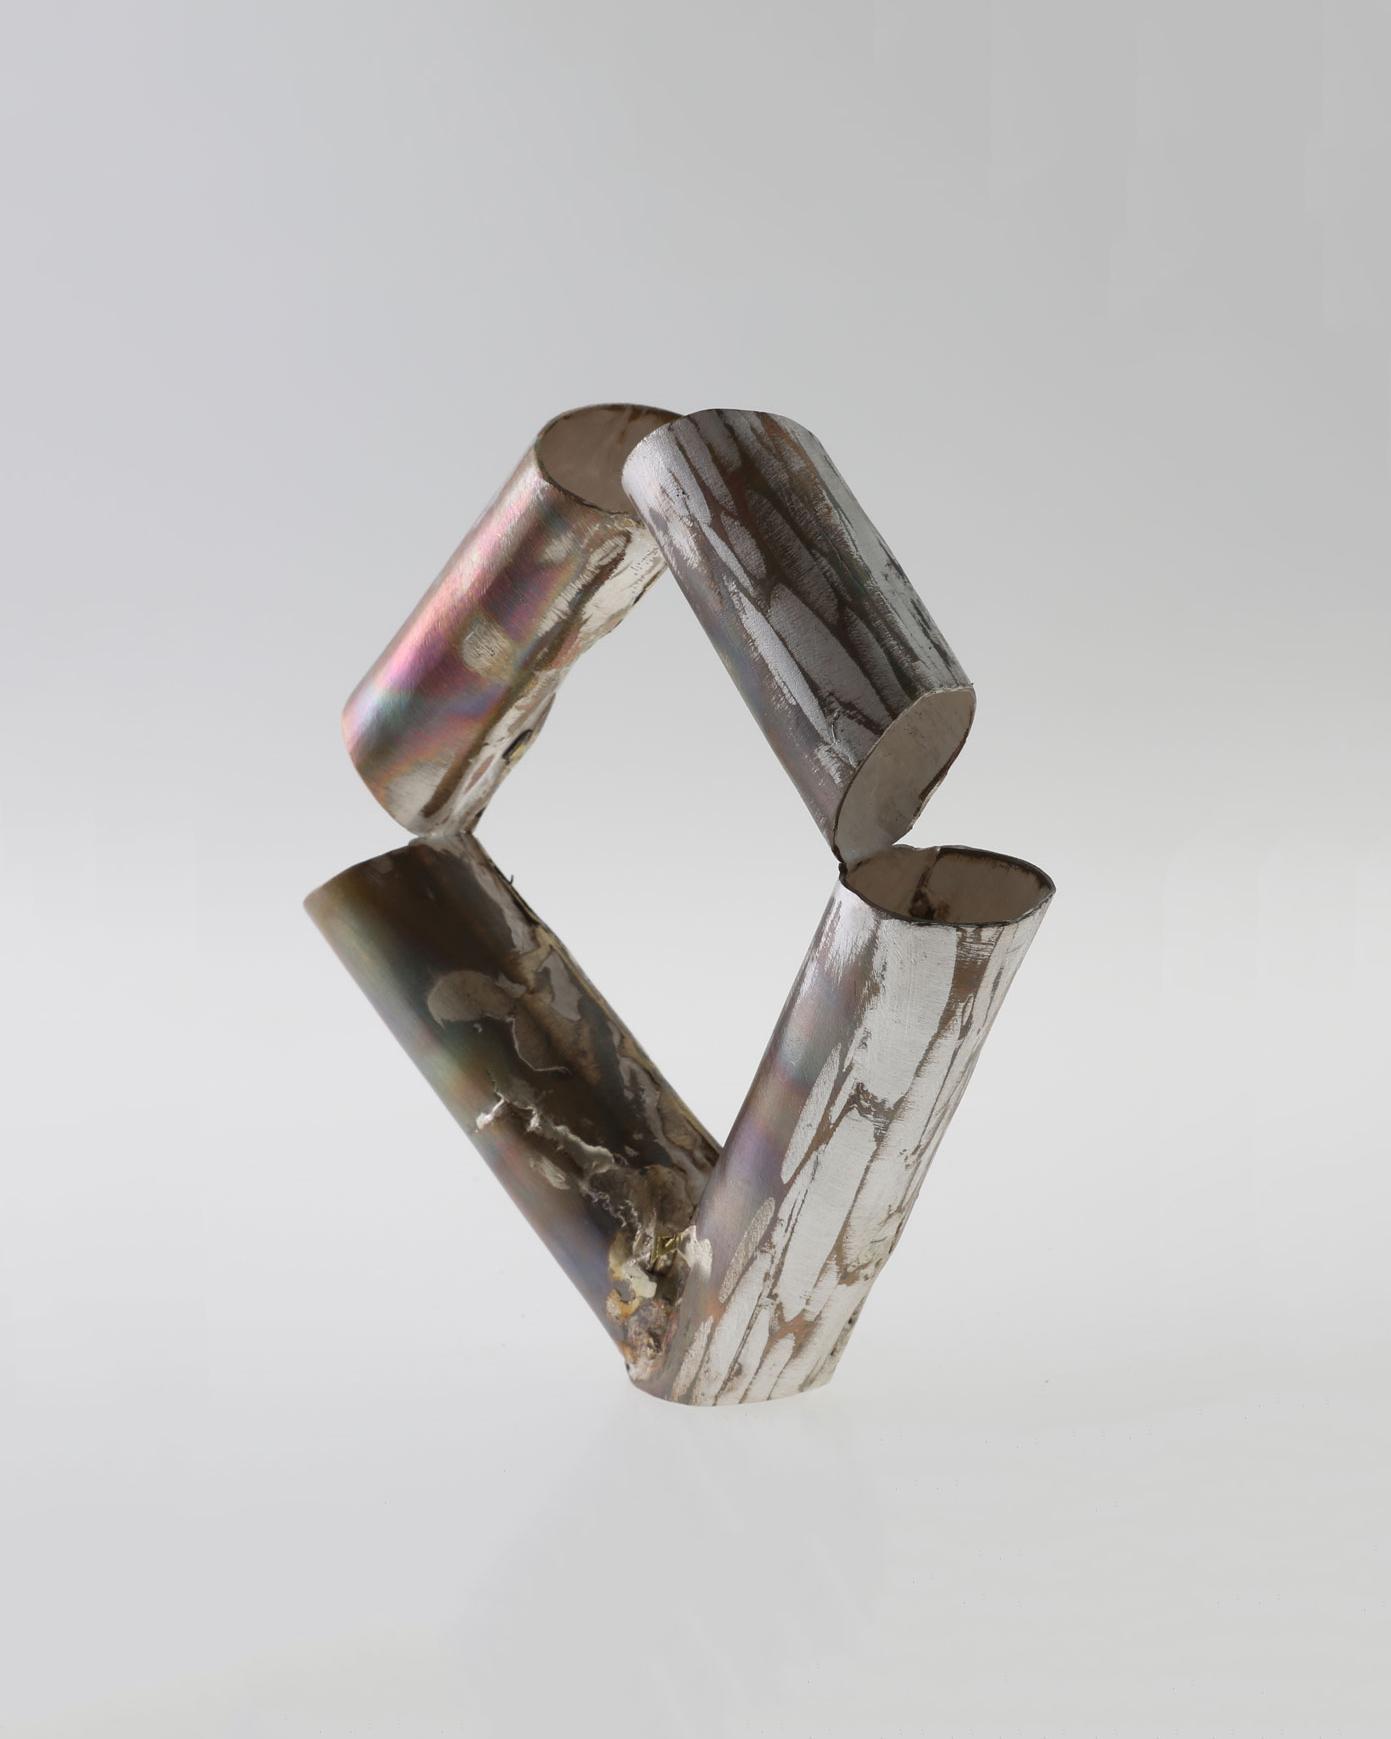 Rudolf Kocéa, Stücke 1 (Fragments 1), 2018, bracelet; silver, copper, ø 60 mm, €2125